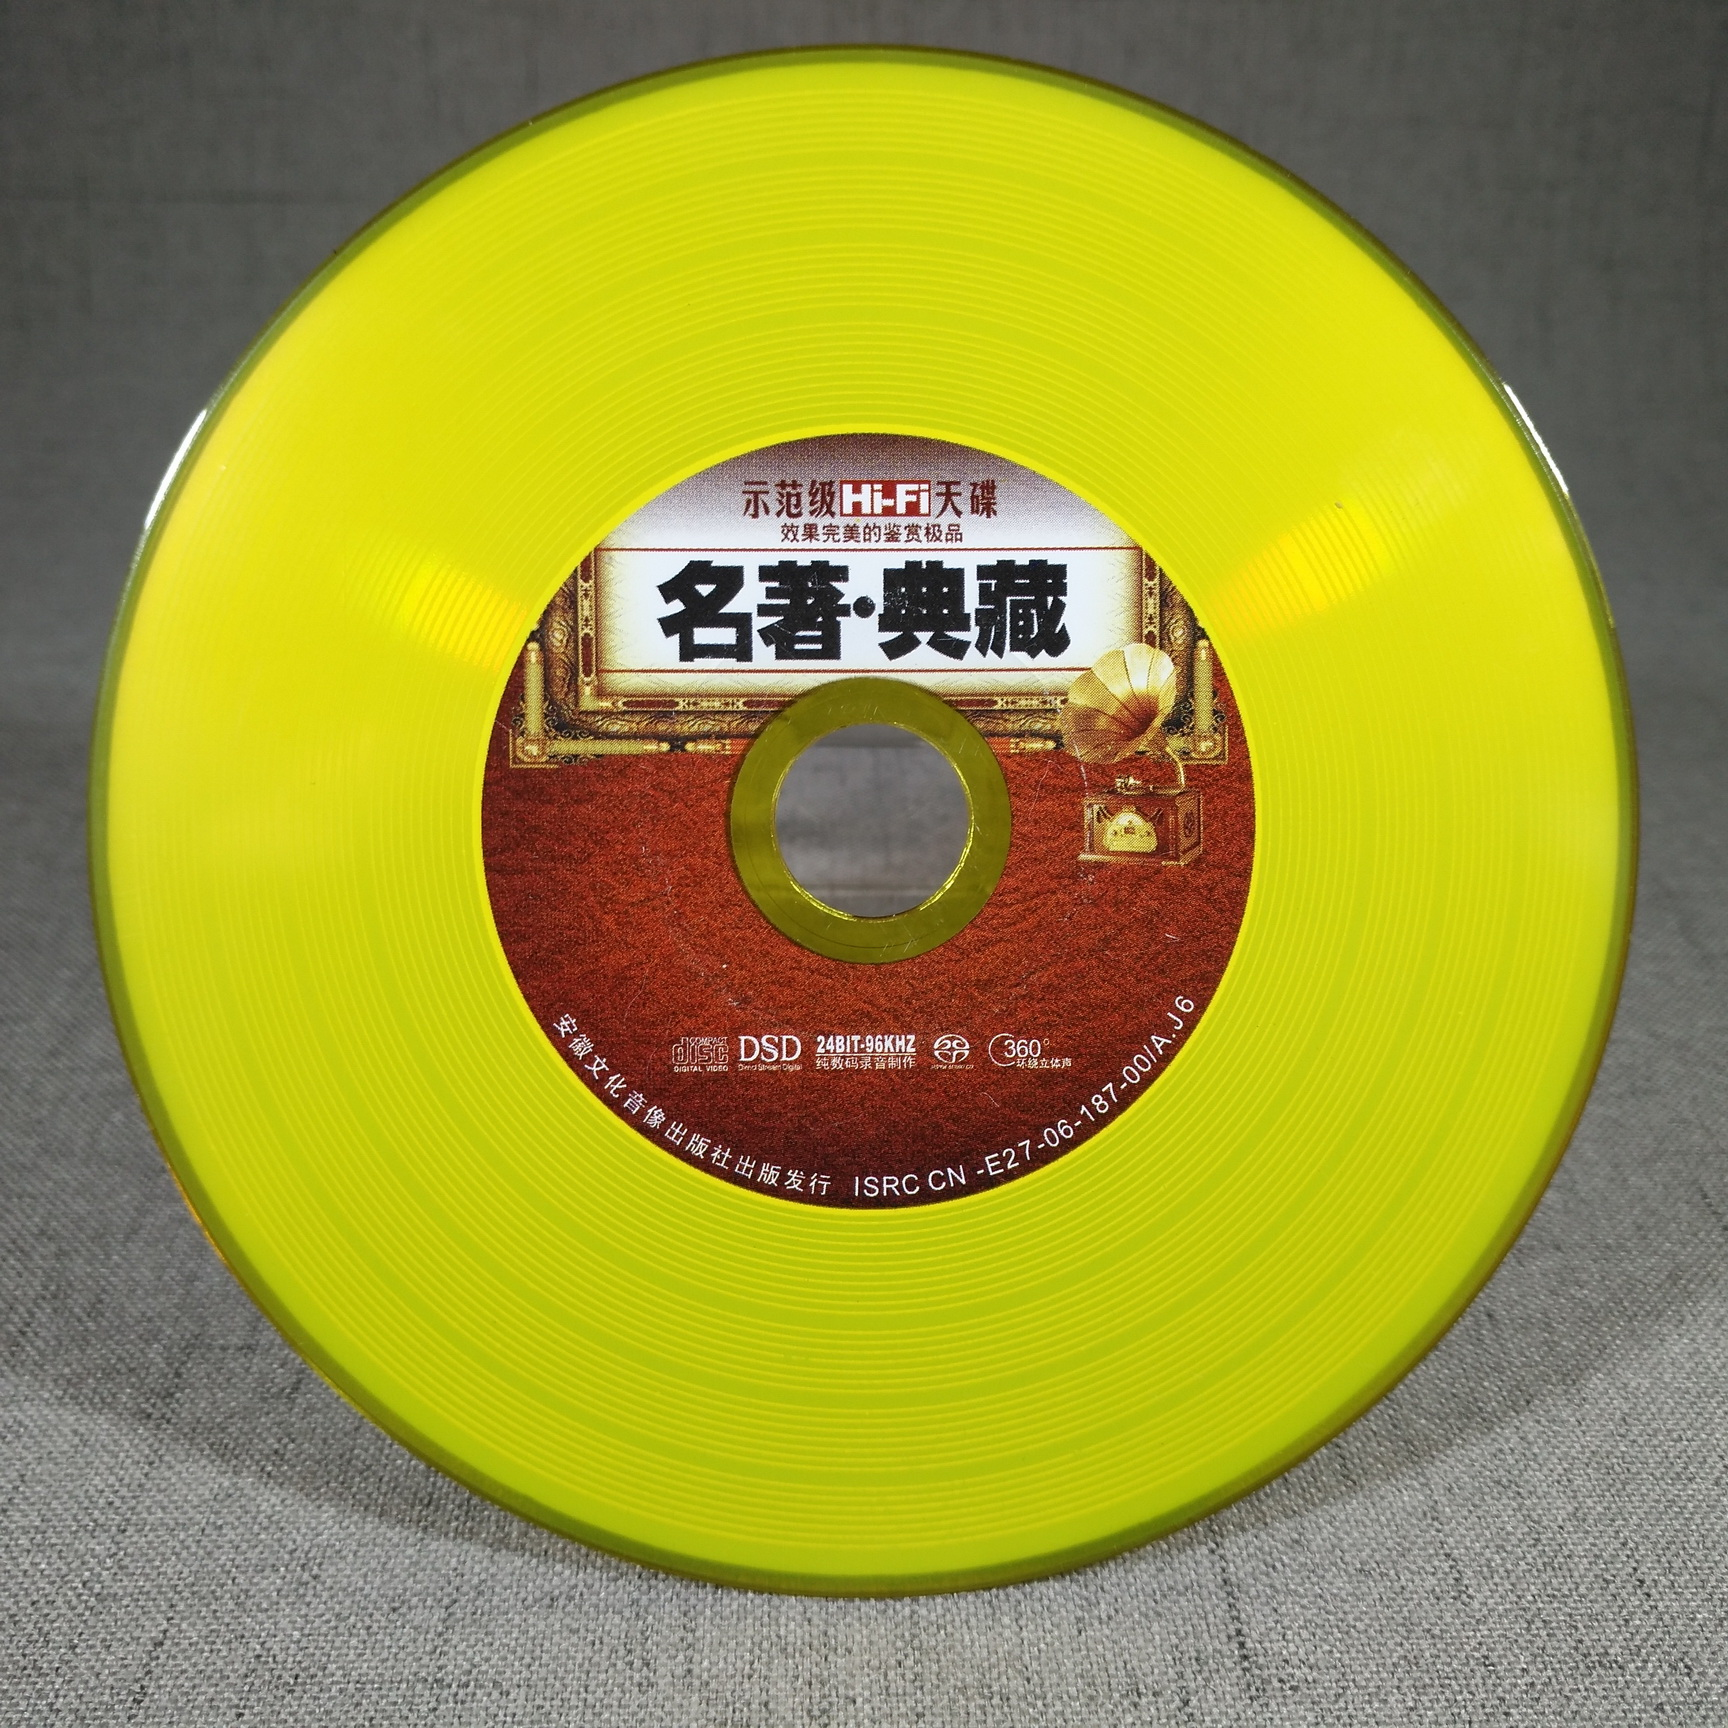 Color Vinyl CD replication